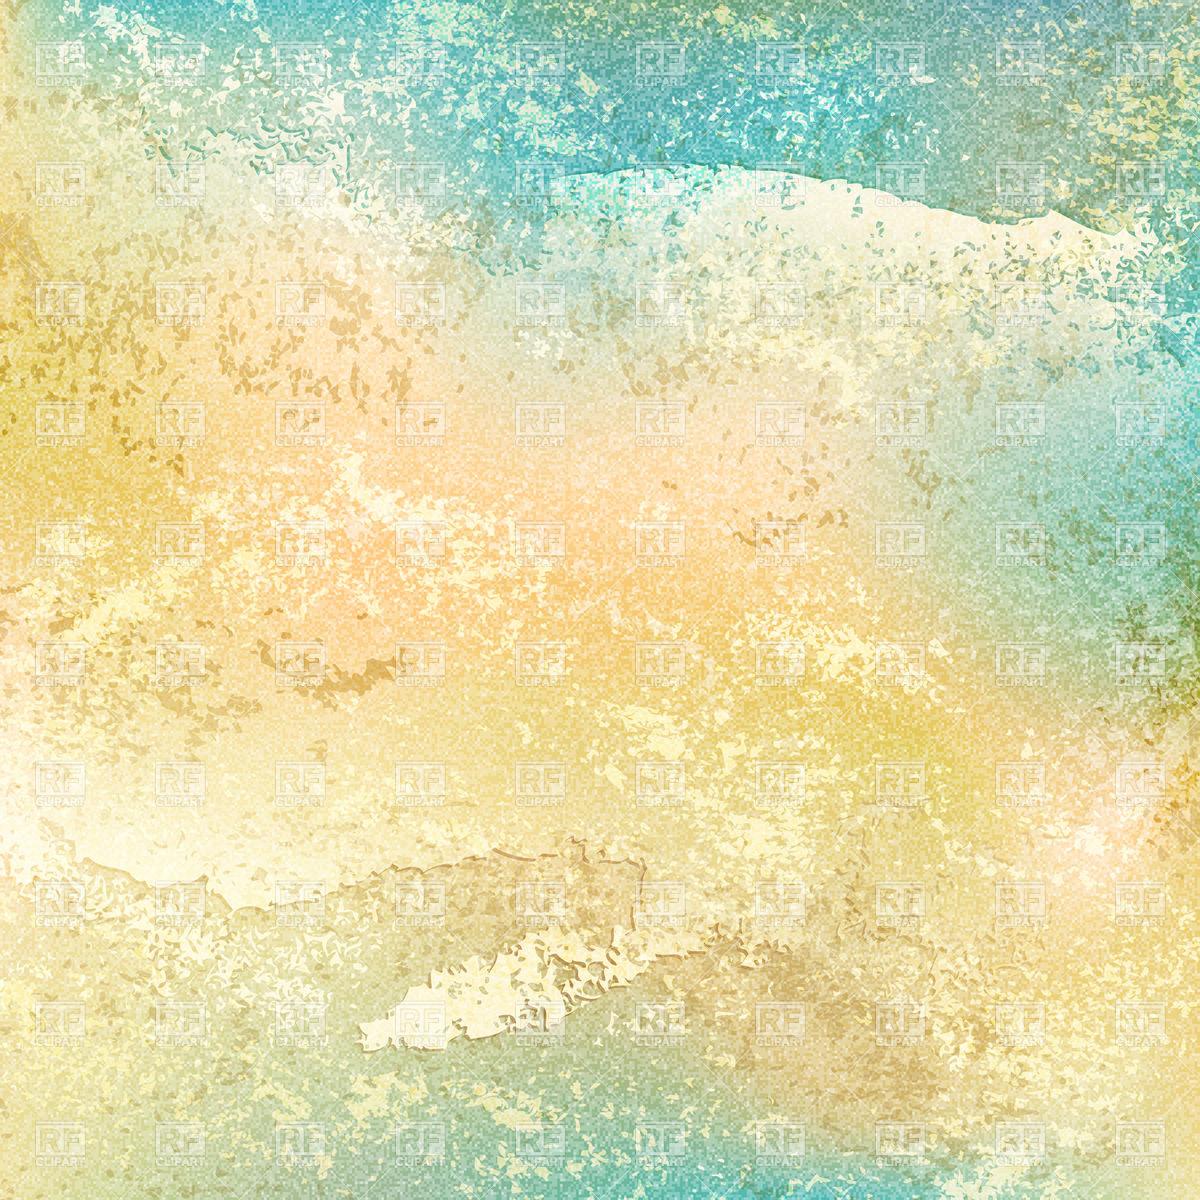 Textured sand.